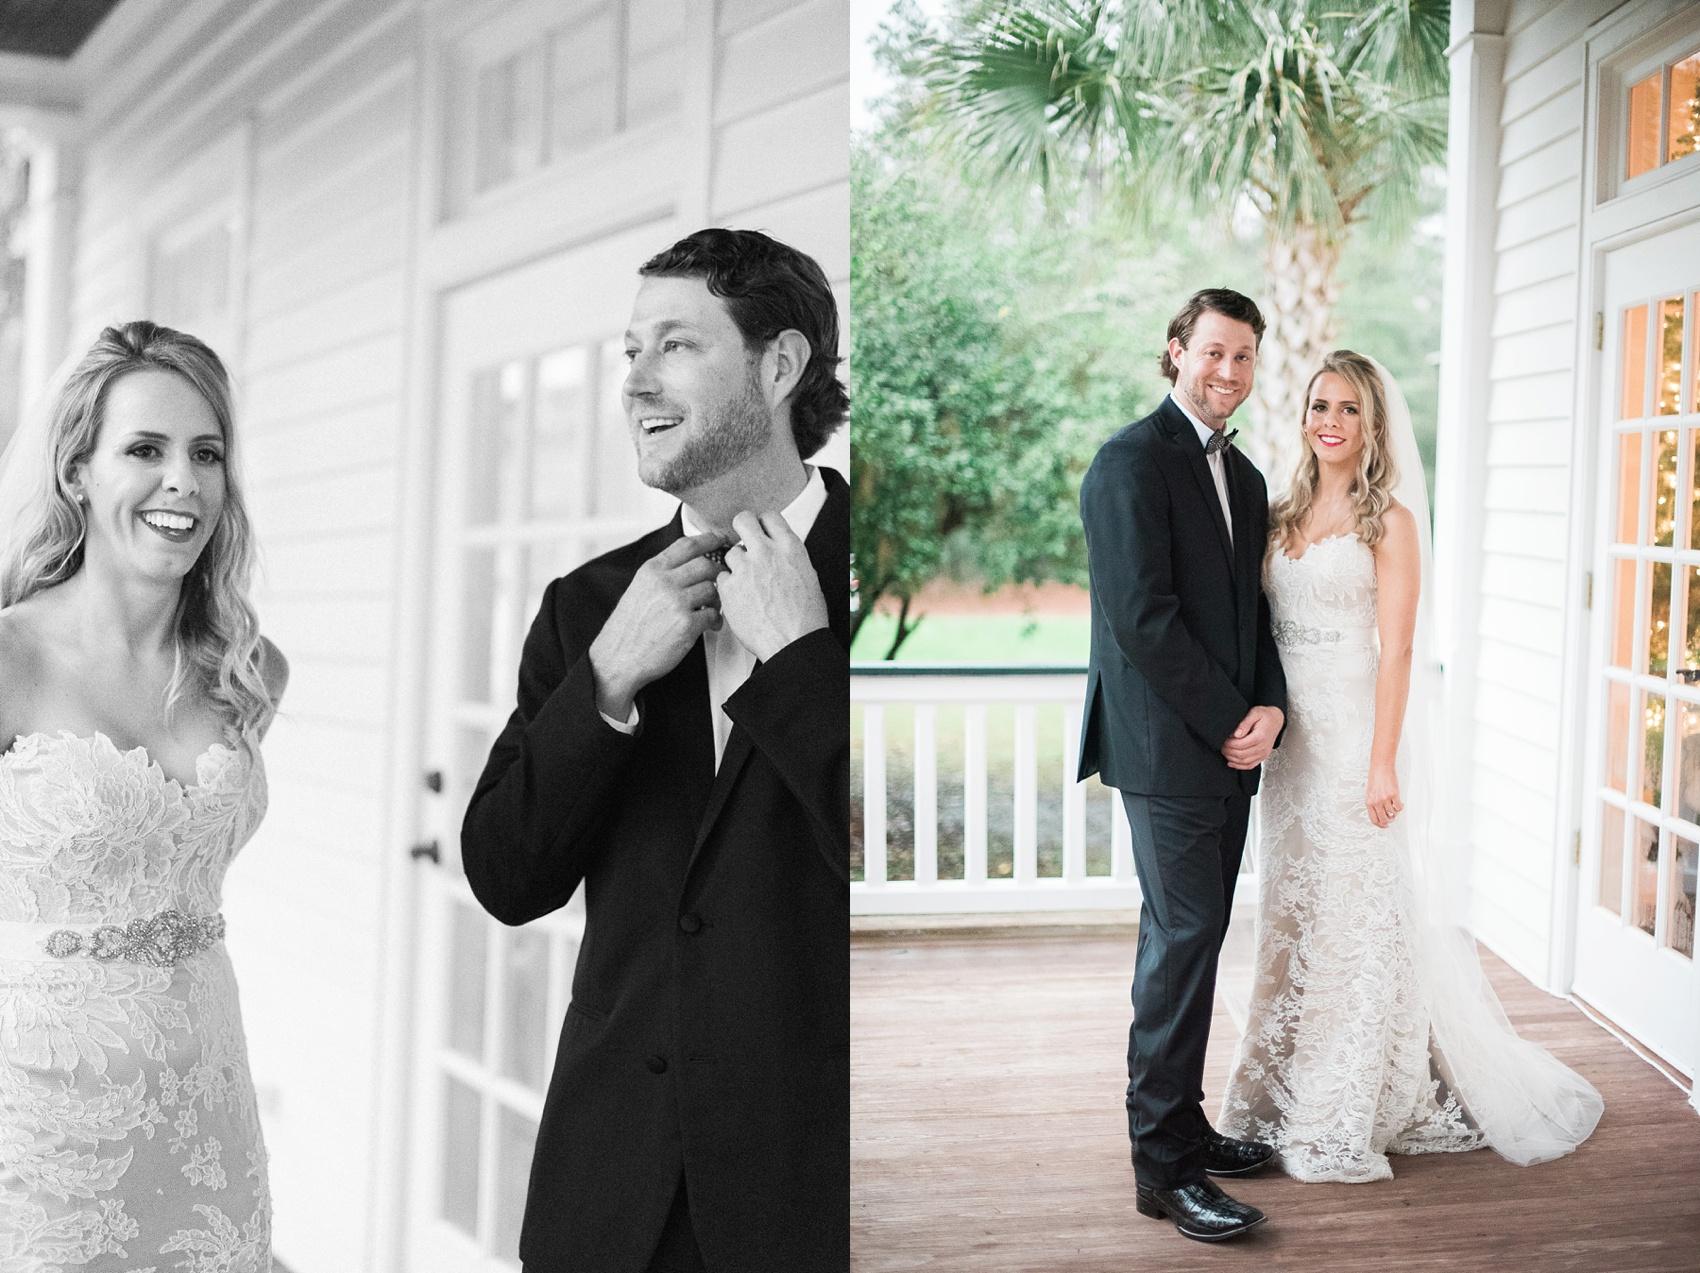 South_carolina_wedding_photographer_0054.jpg